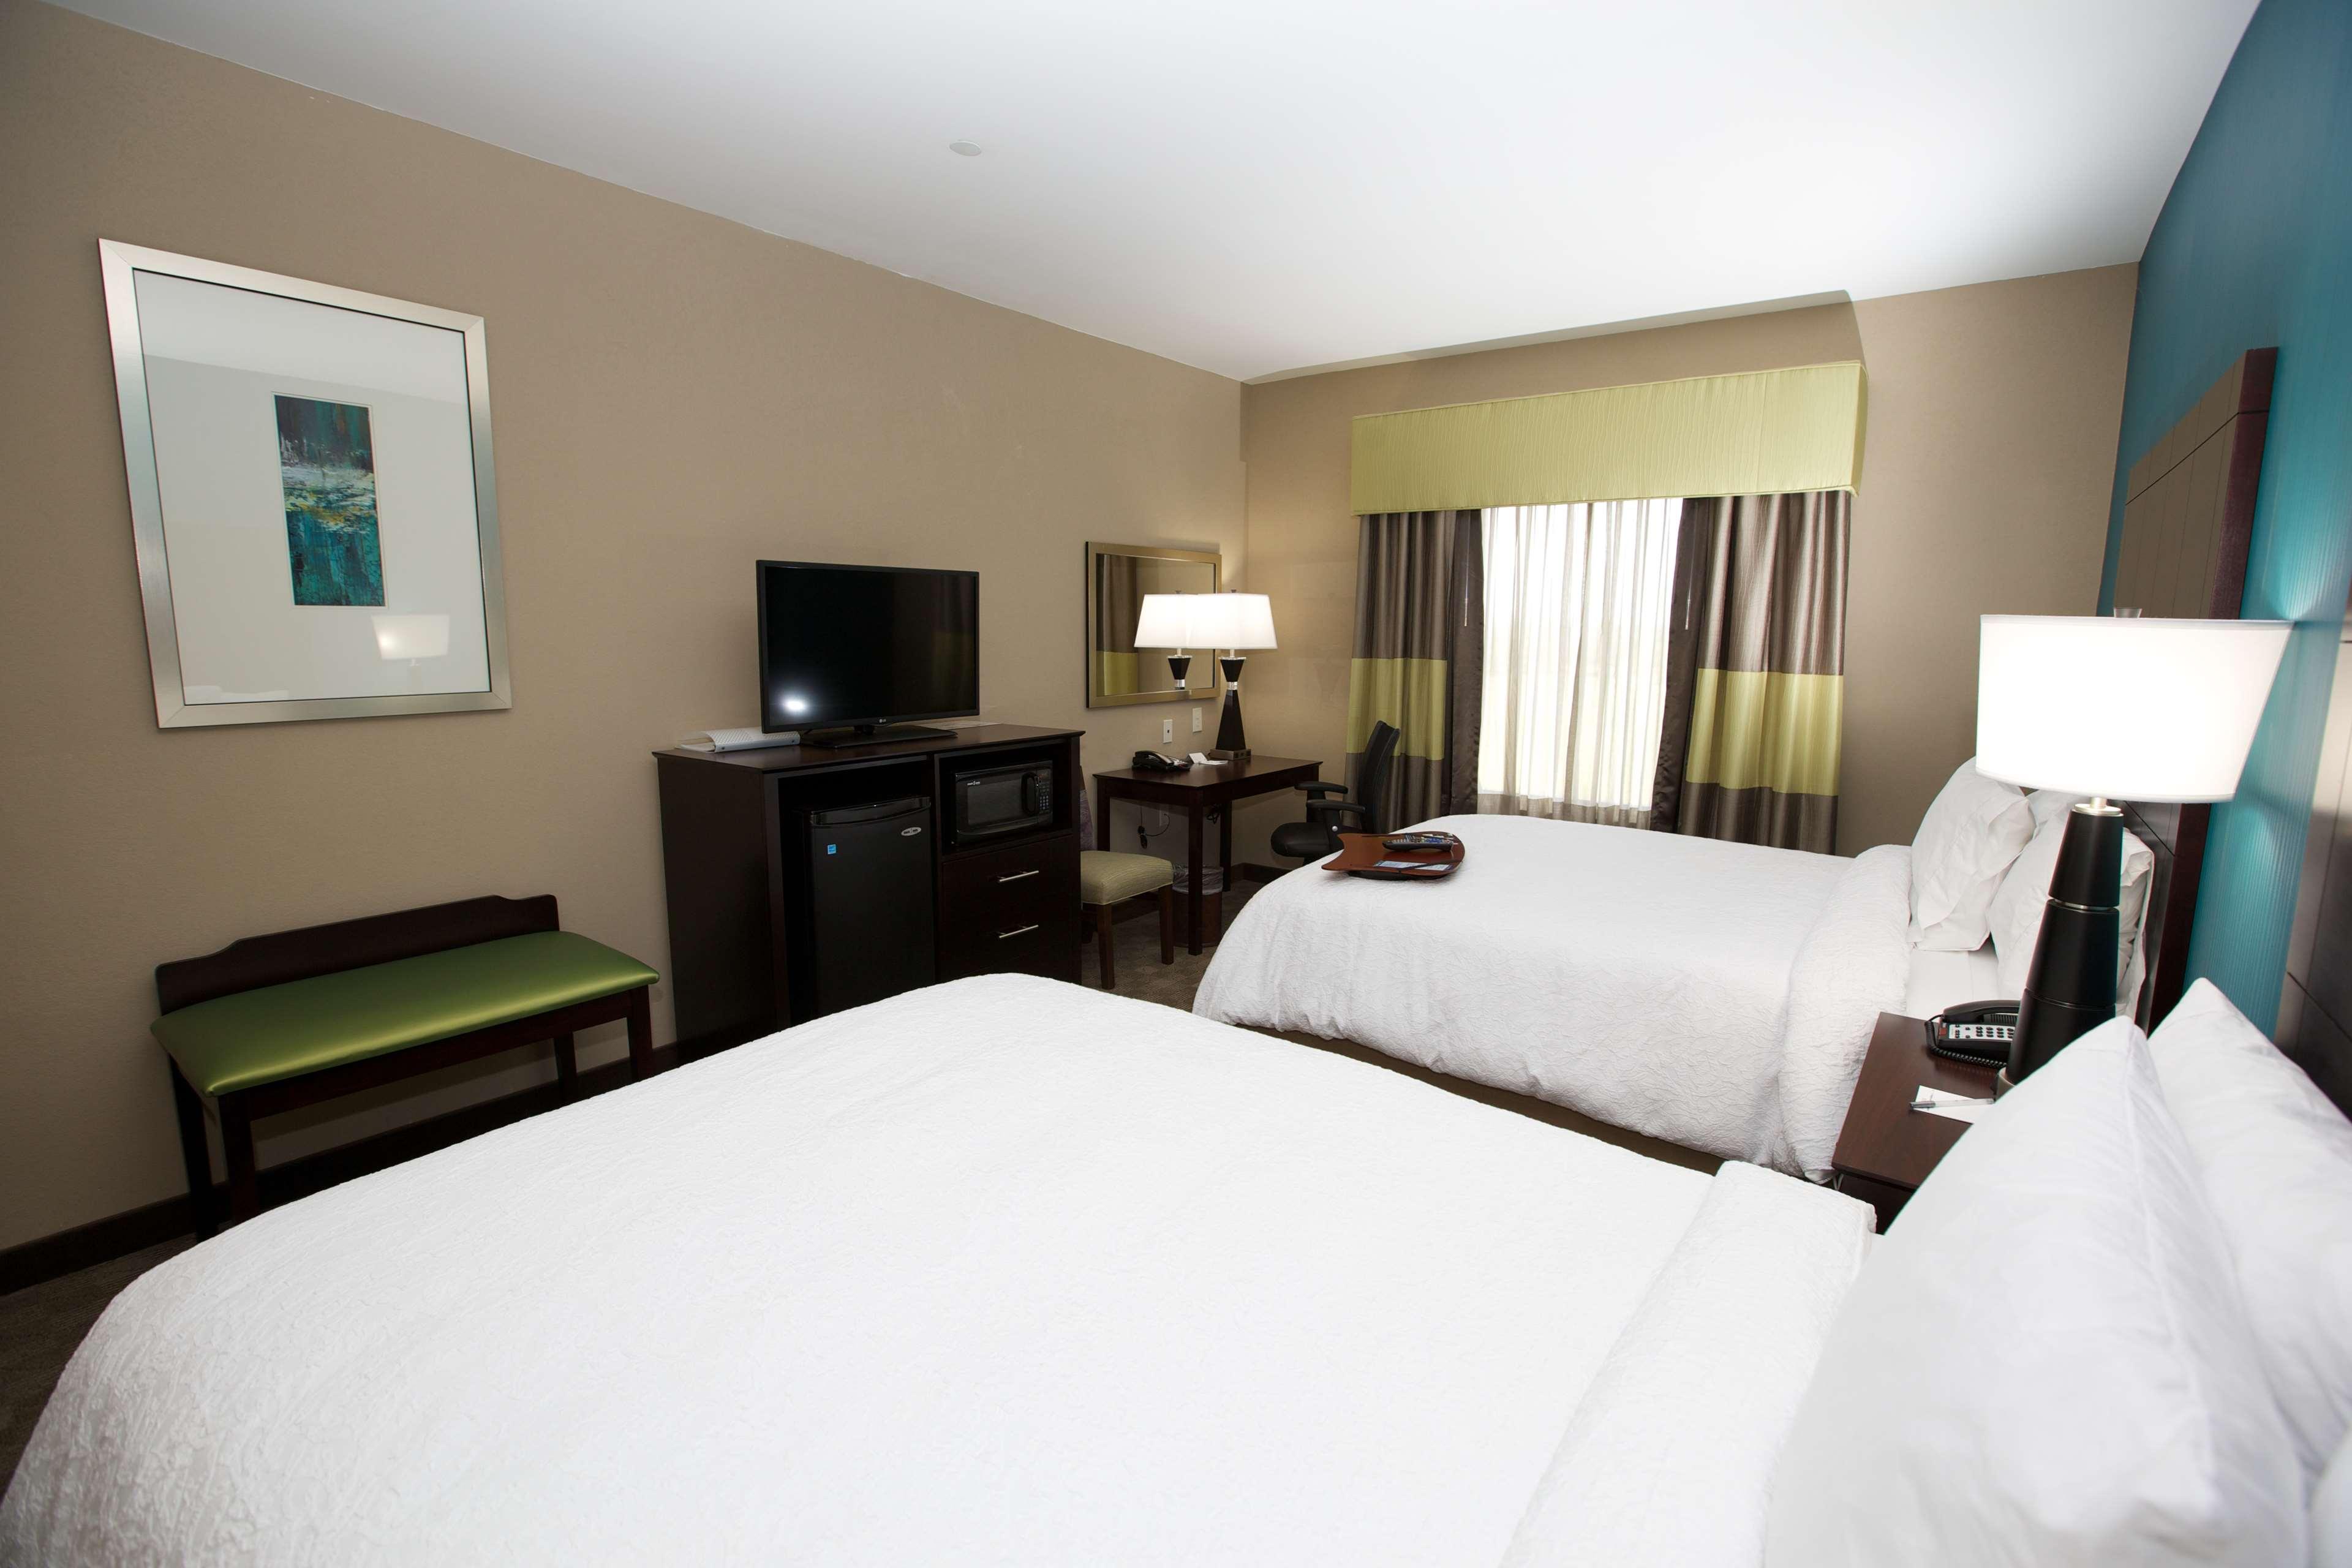 Hampton Inn & Suites Missouri City, TX image 31